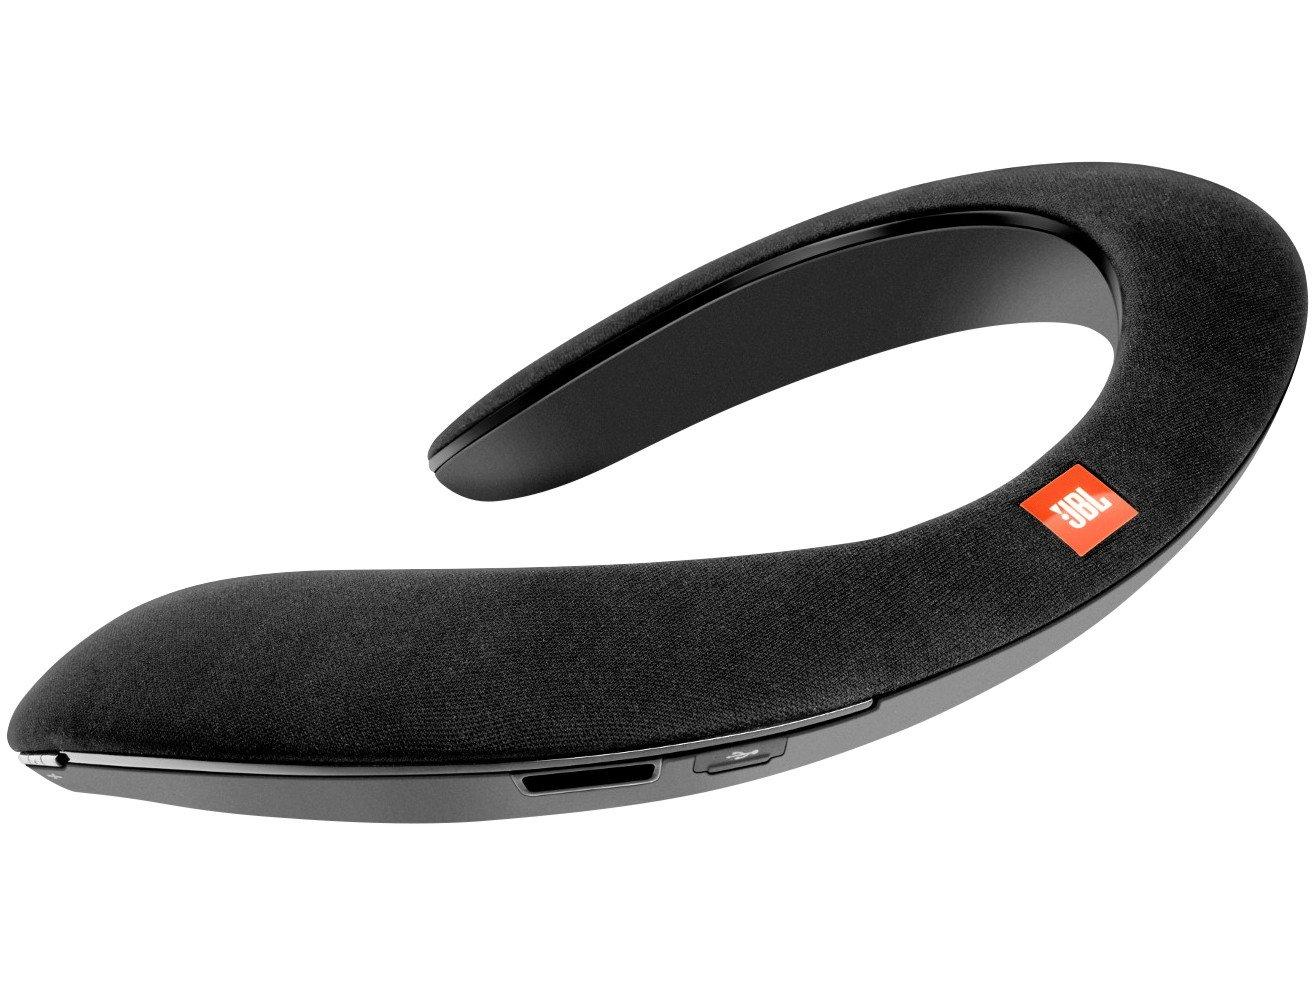 Caixa de Som Bluetooth JBL Soundgear Portátil - com Microfone Preta - Bivolt - 1